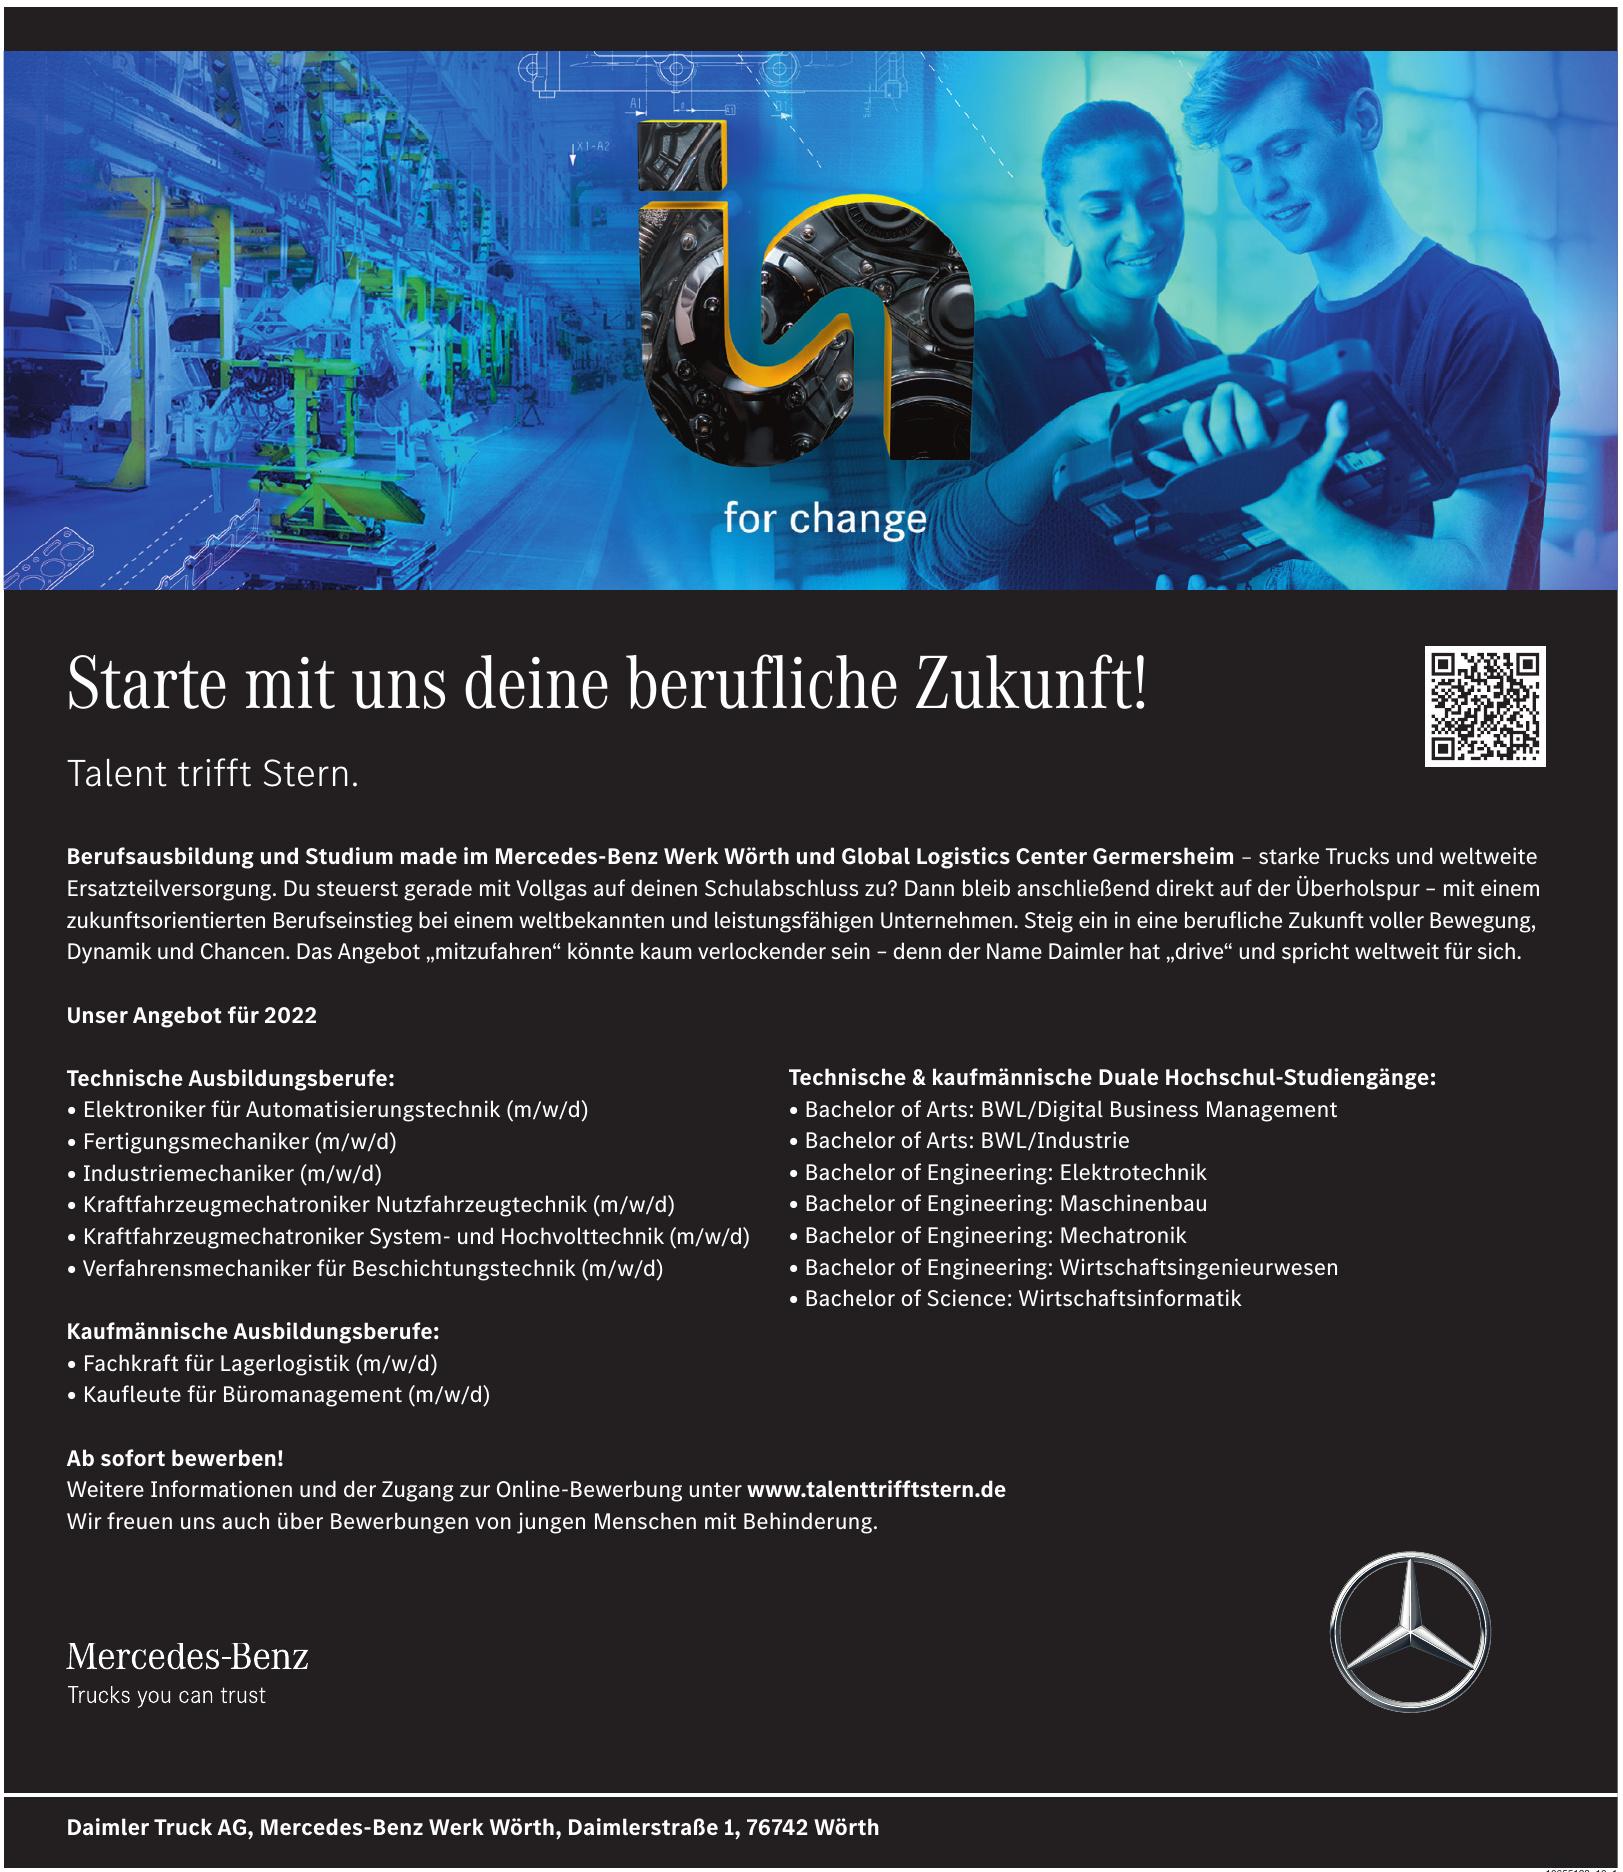 Daimler Truck AG, Mercedes-Benz Werk Wörth